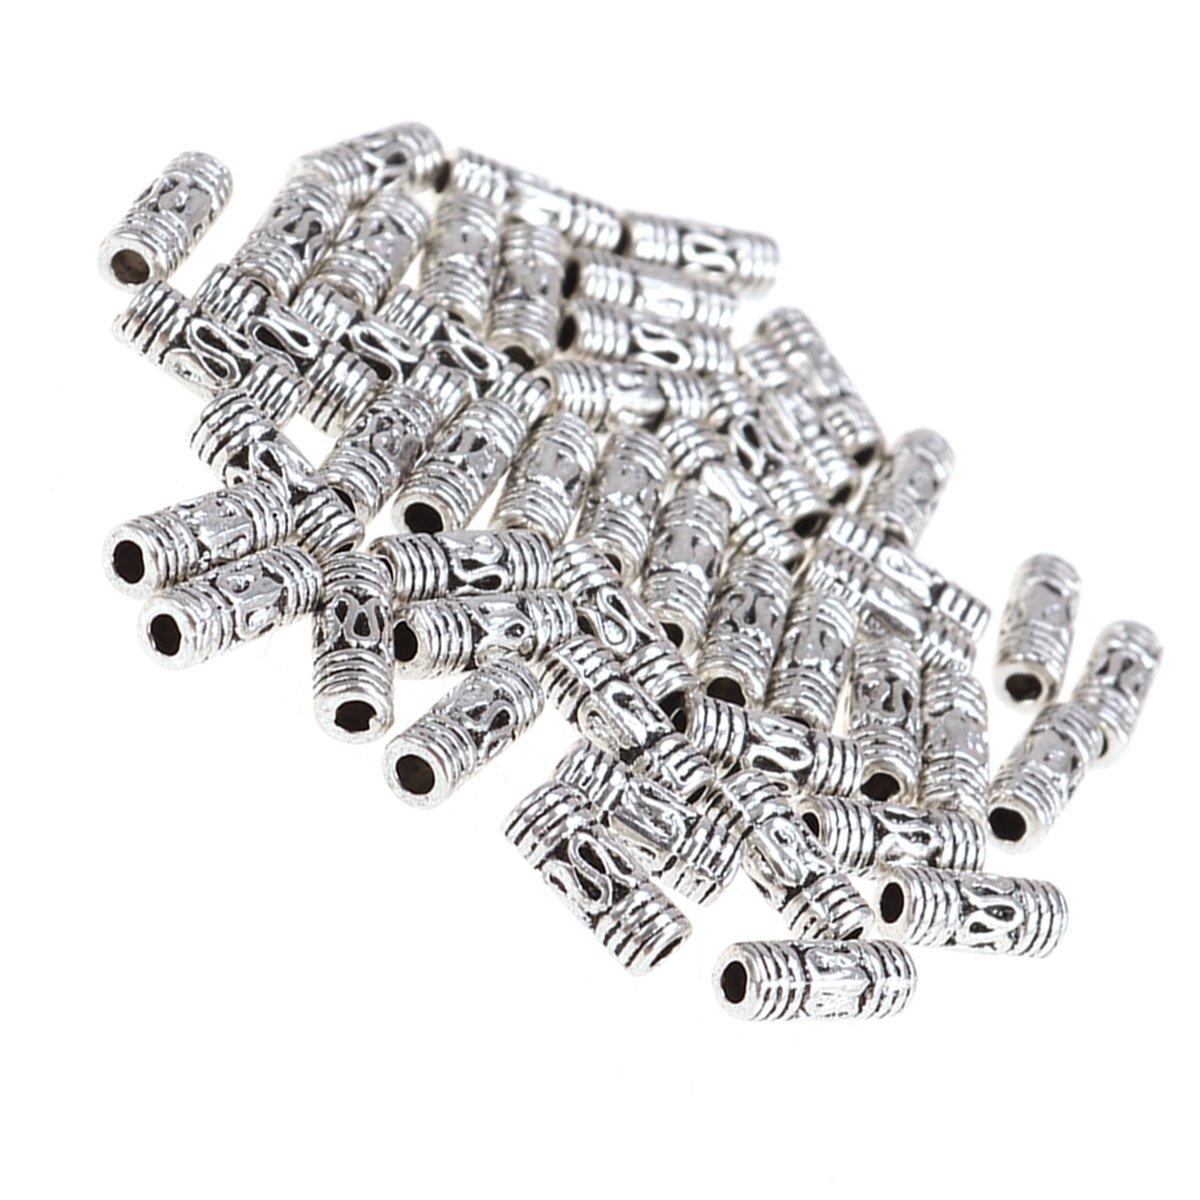 5 abalorios metal plata el Tíbet 17mm Tube//tubo entre perlas joyas Best f229